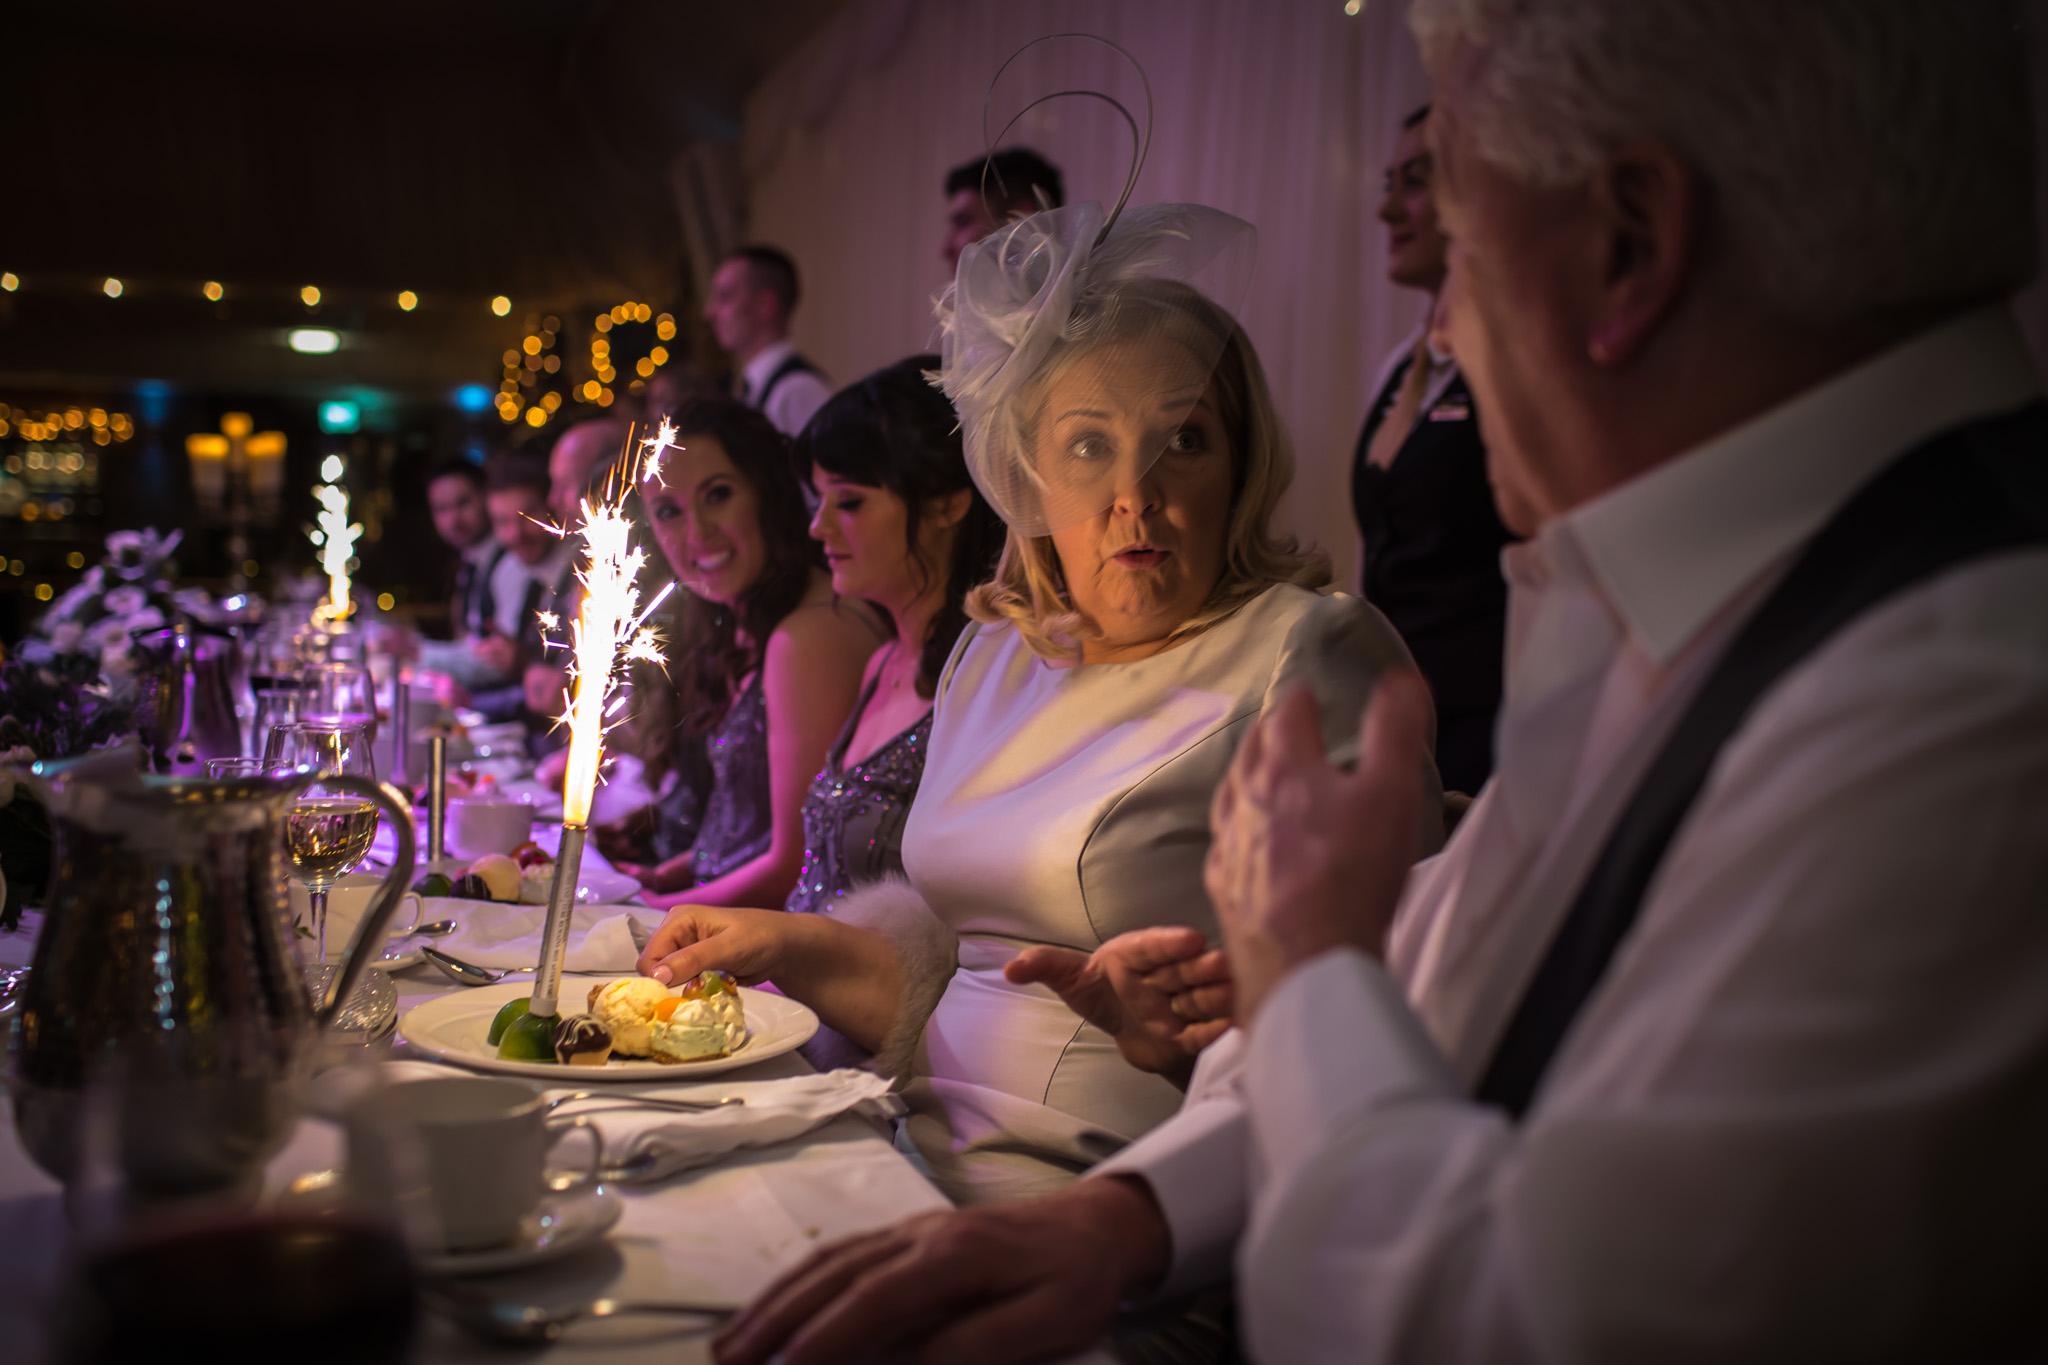 Mark_Barnes_Northern_Ireland_wedding_photographer_Harveys_Point_Donegall_Wedding_photography-Adam&Gemma-58.jpg